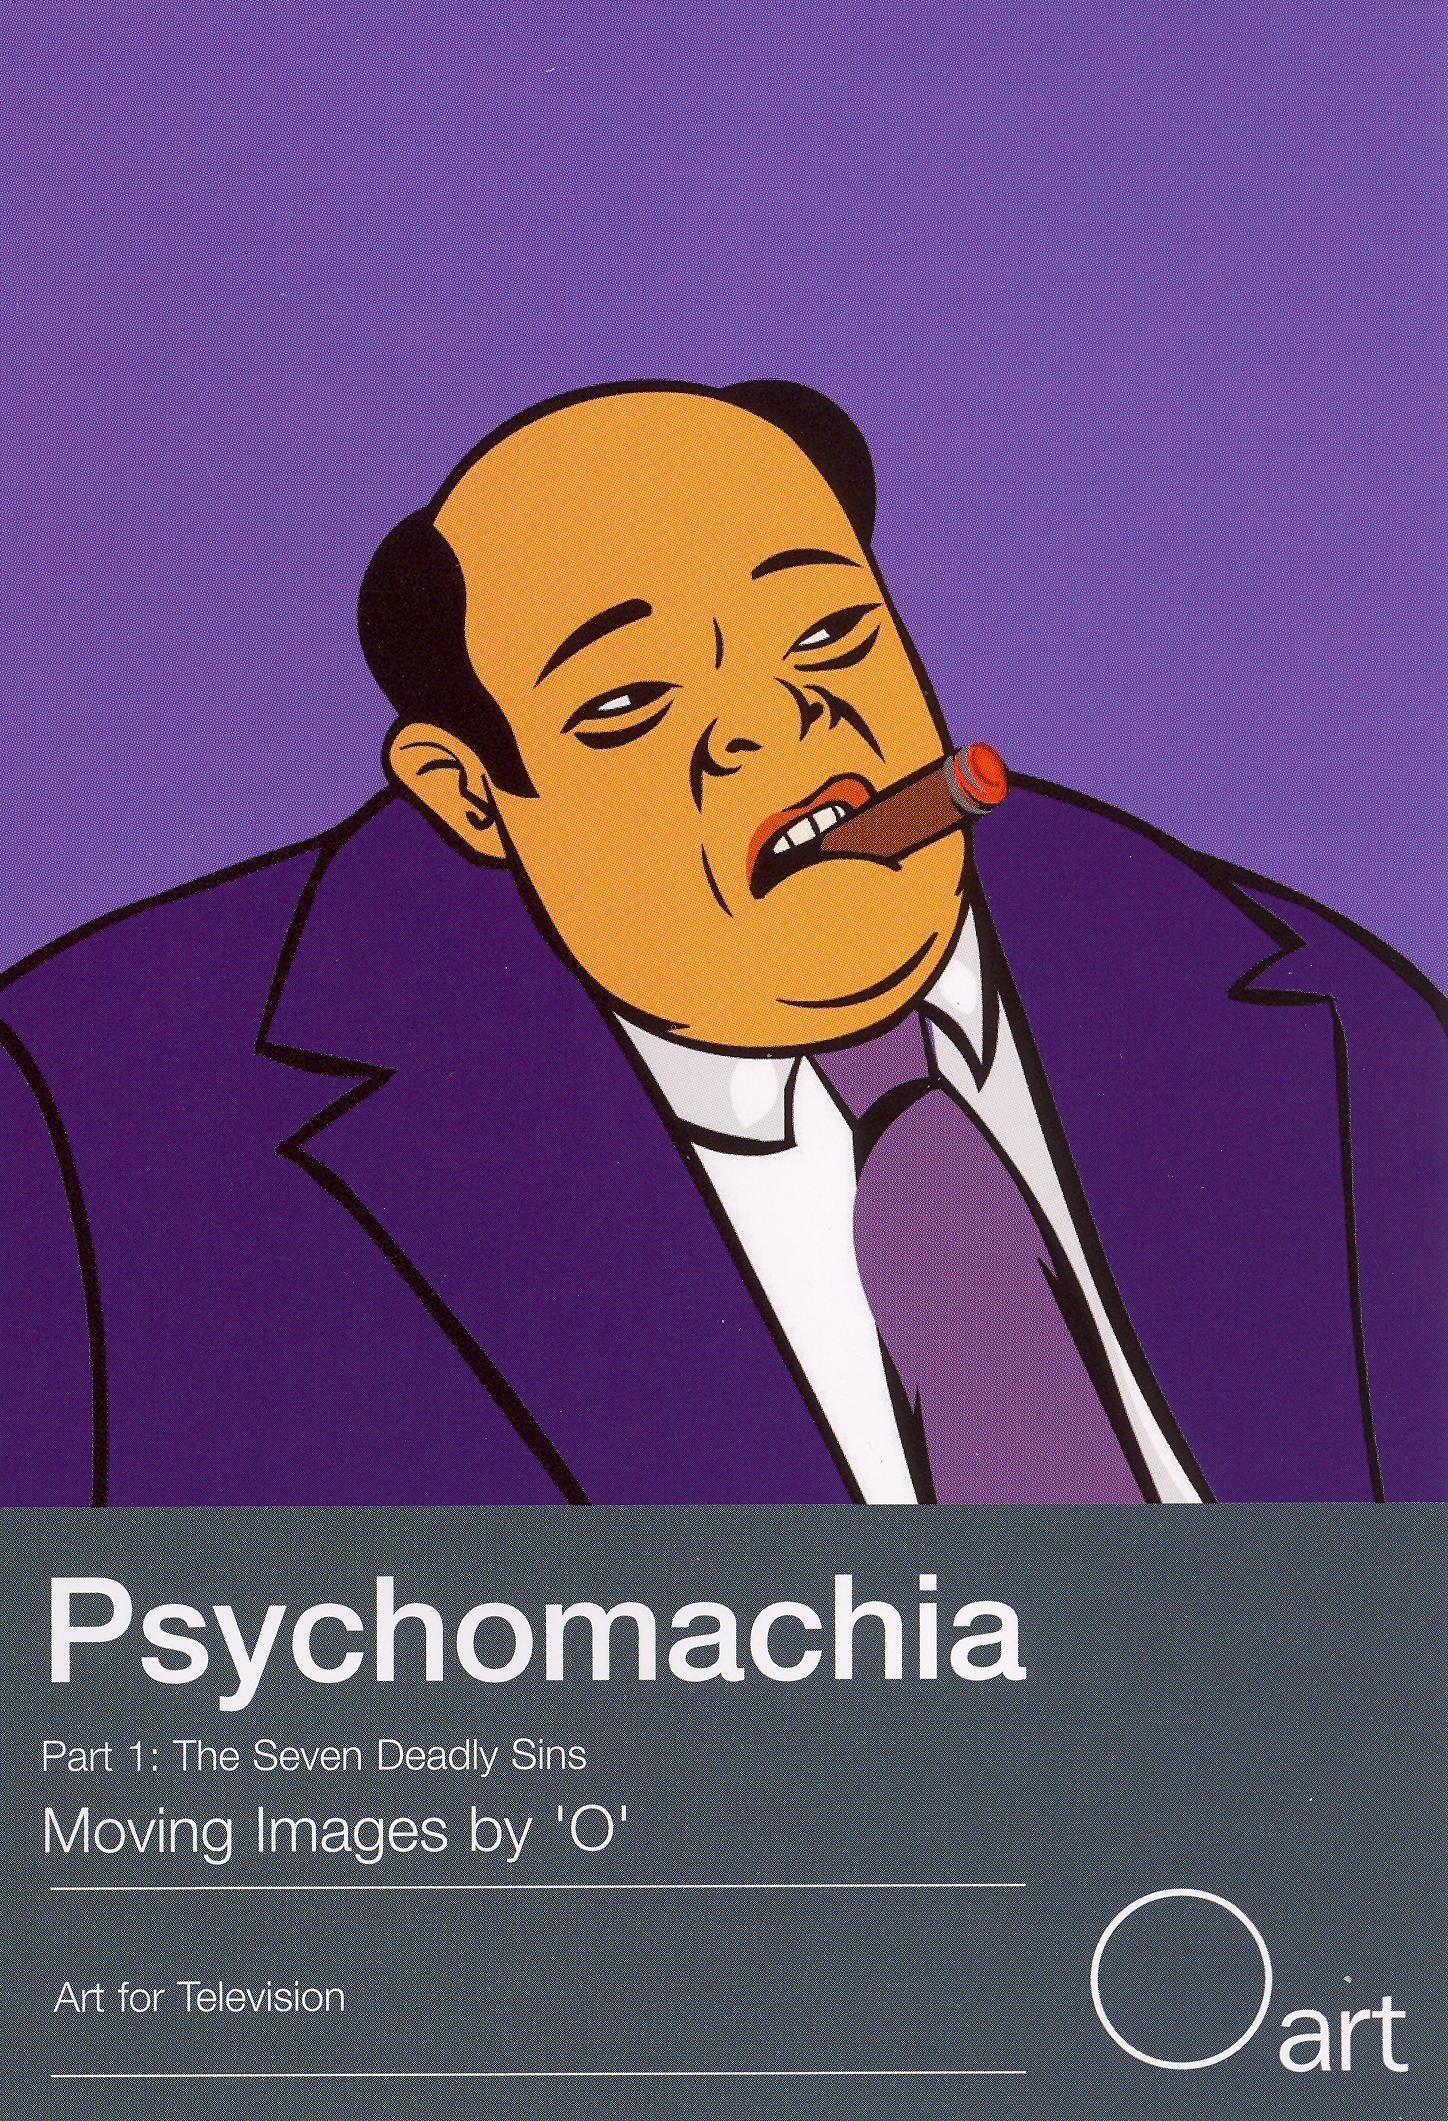 Psychomachia, Part 1: The Seven Deadly Sins